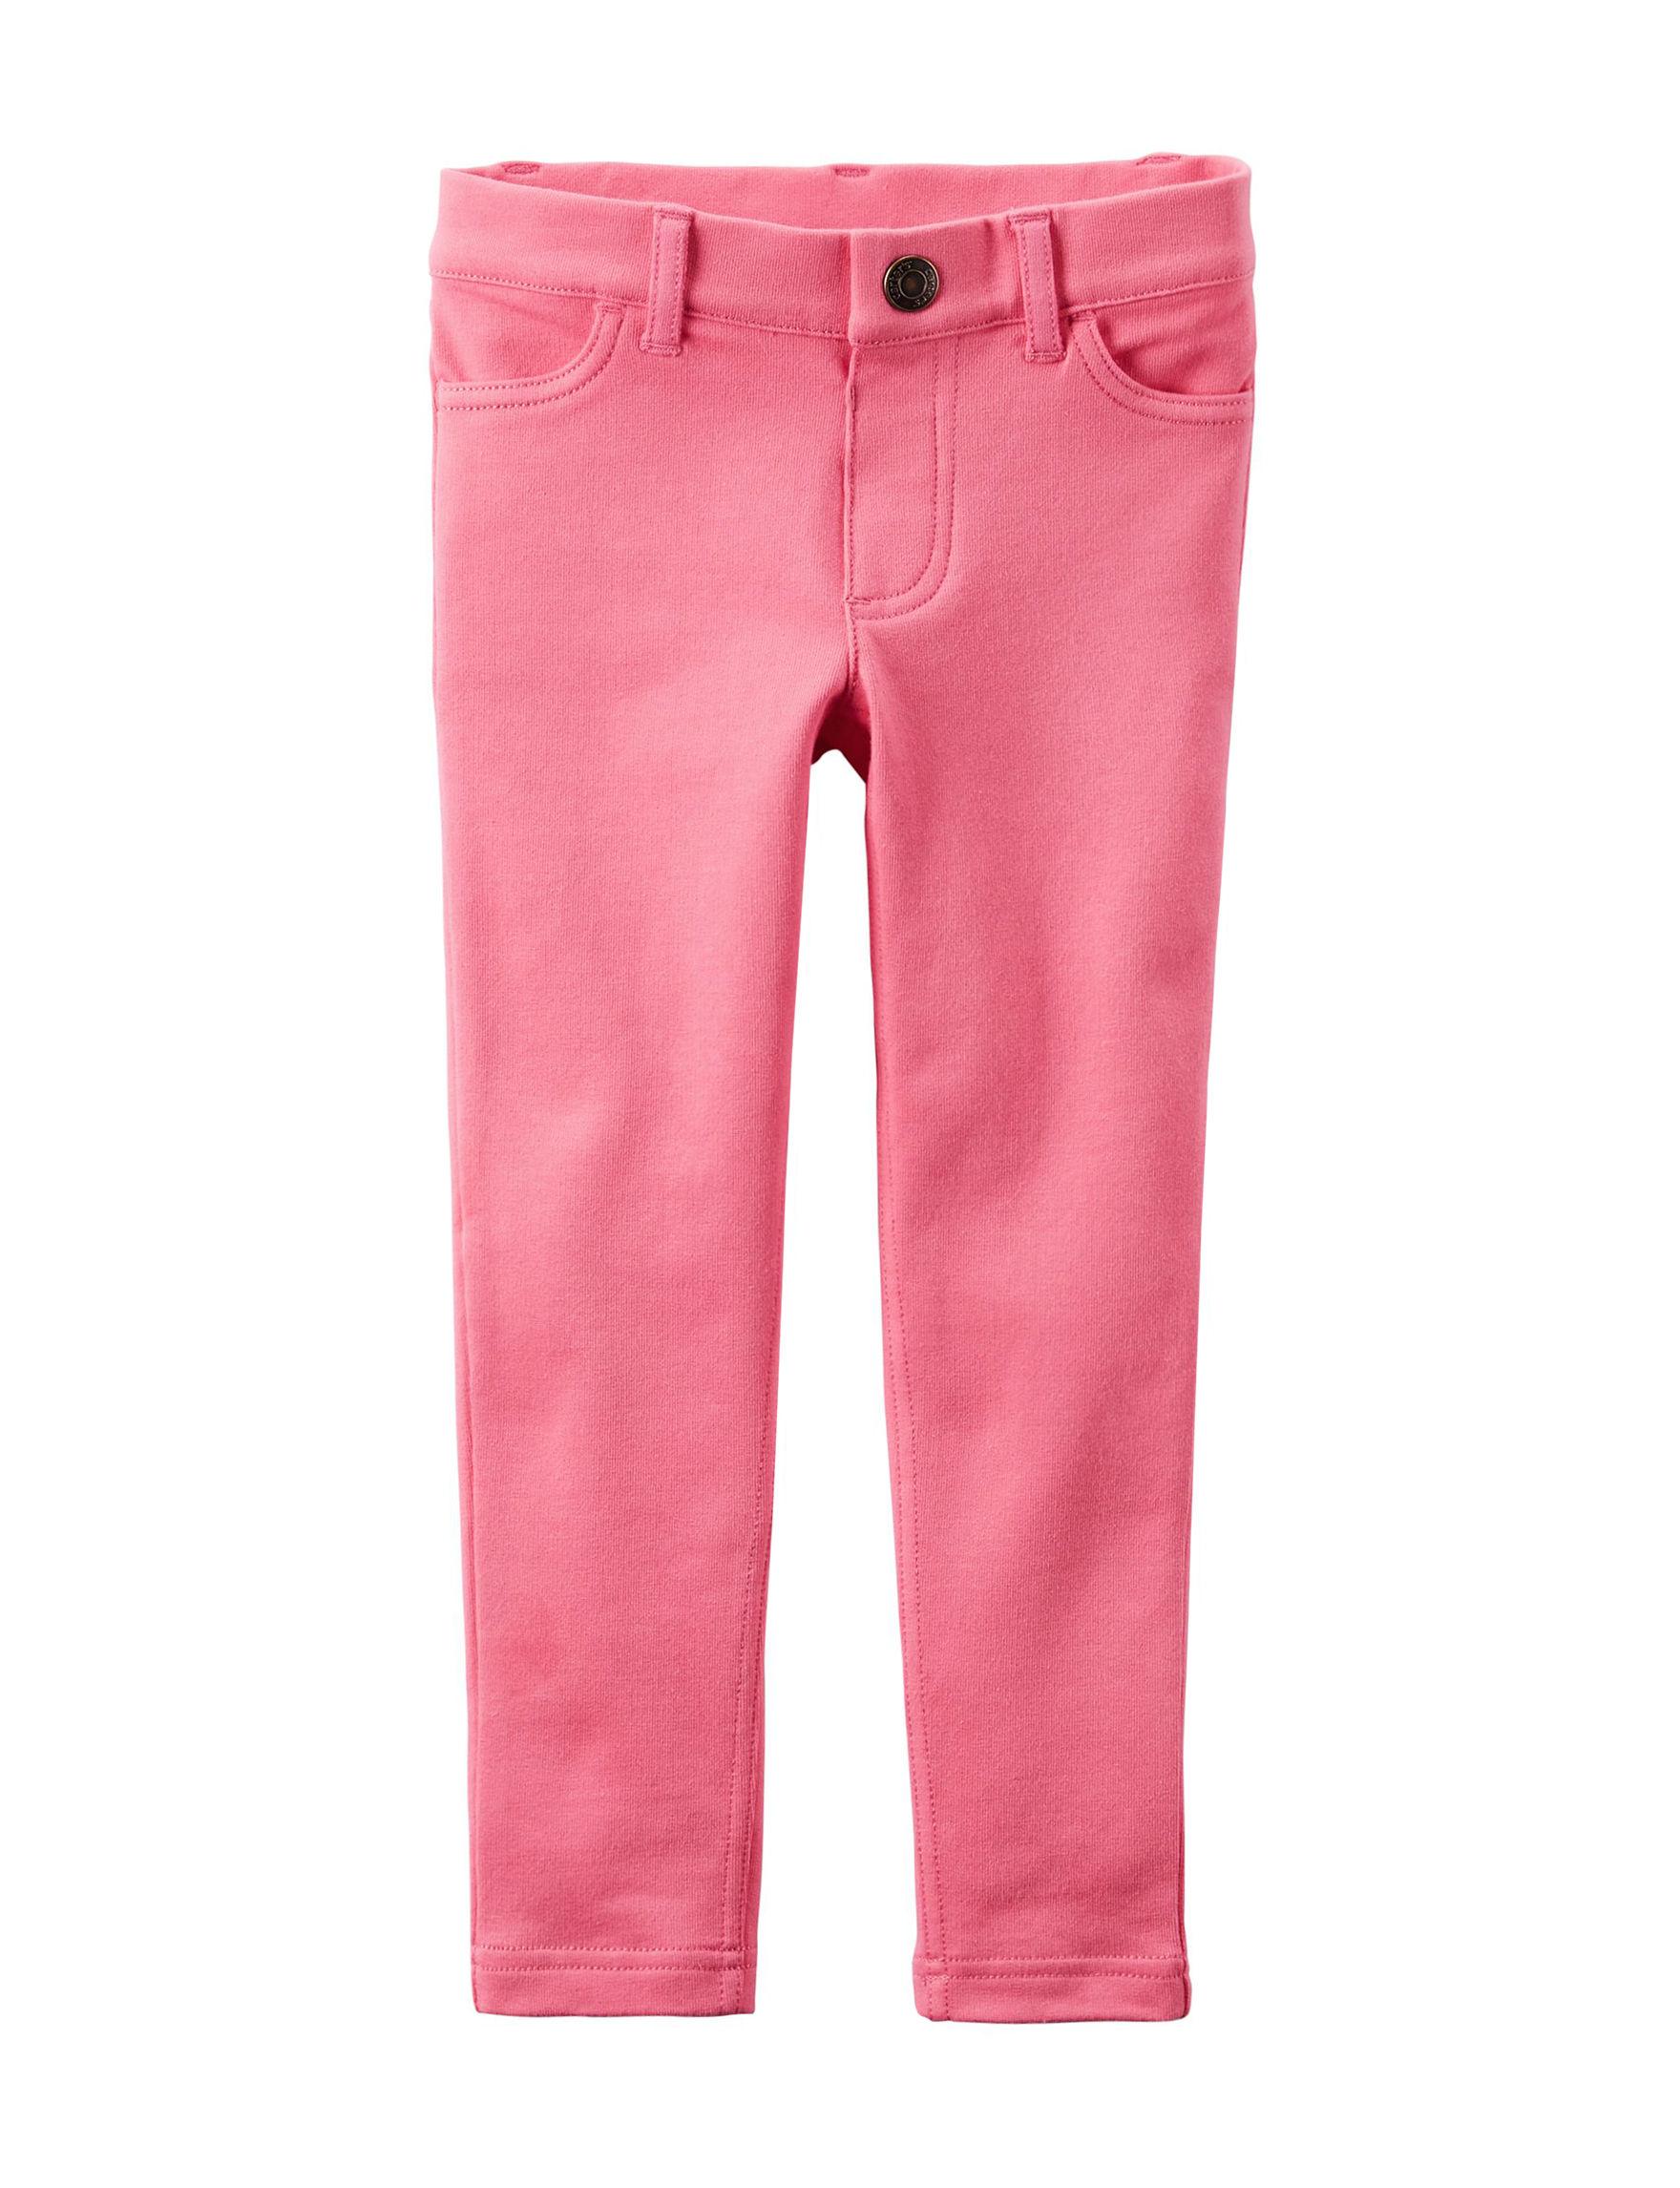 Carter's Pink Skinny